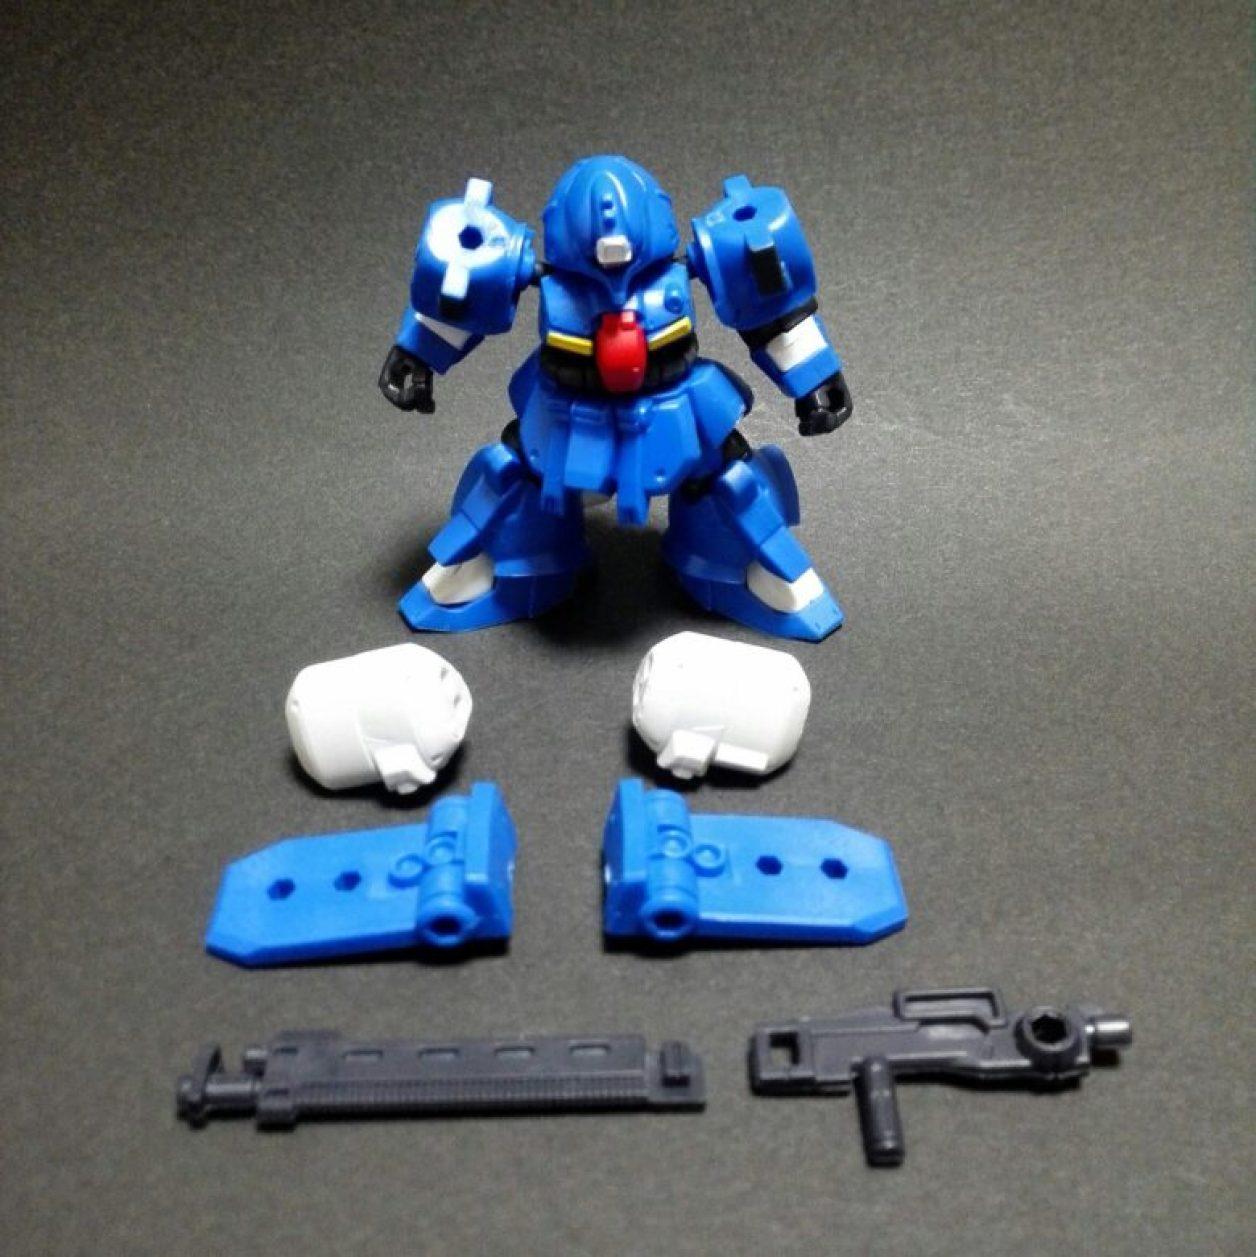 mobile suit ensemble 13弾 ゼクアインとMS武器セットの組み合わせよりゼクアイン第3種兵装の組立方法を示した画像